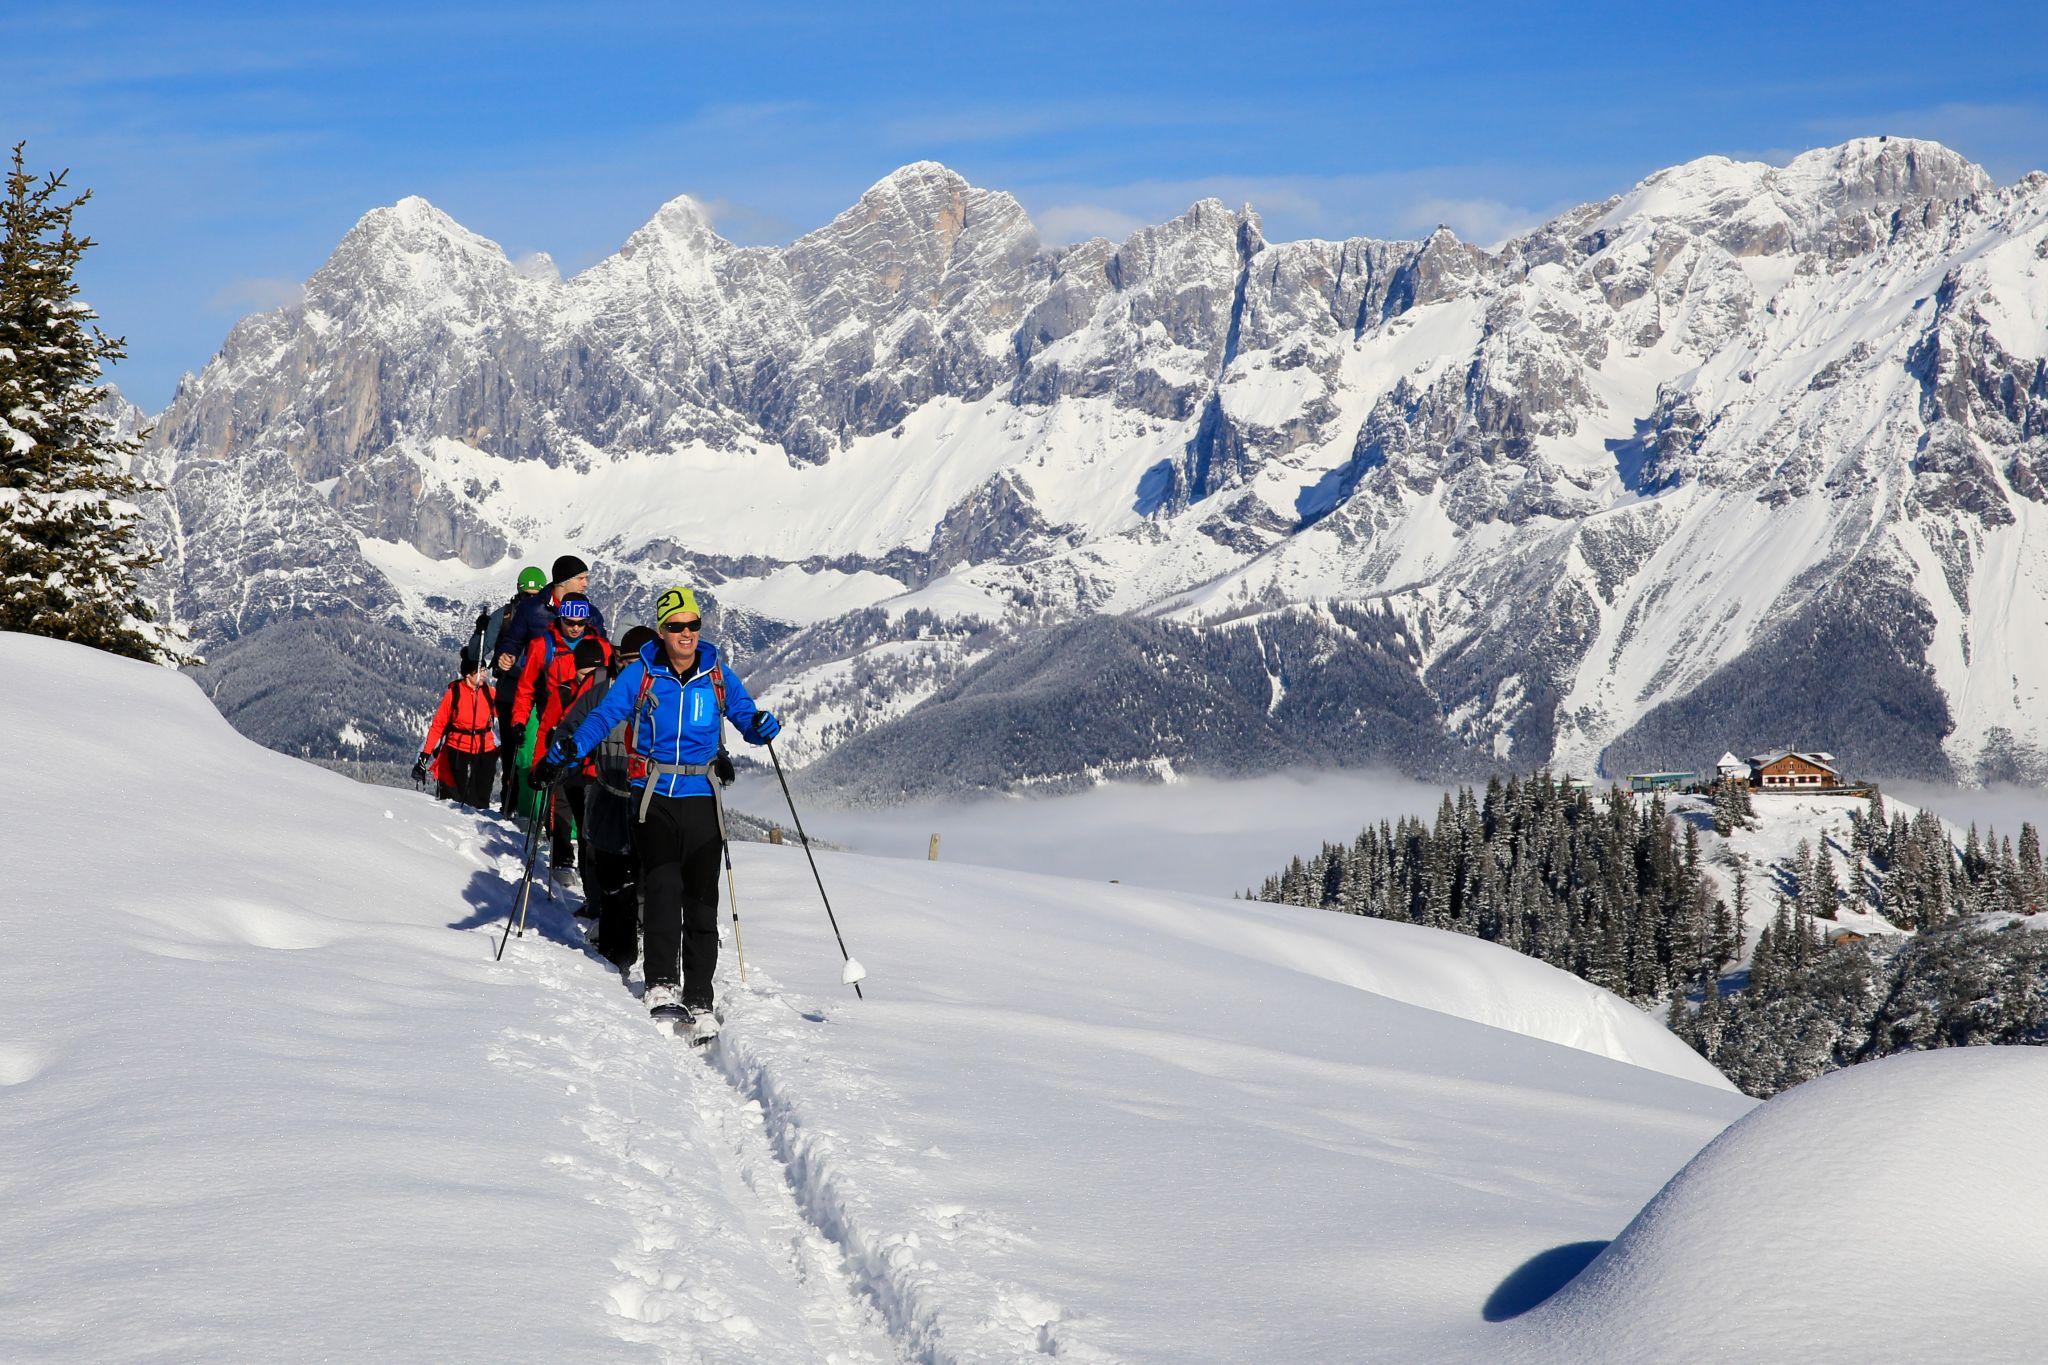 Schneeschuhwanderer auf dem Rossfeld